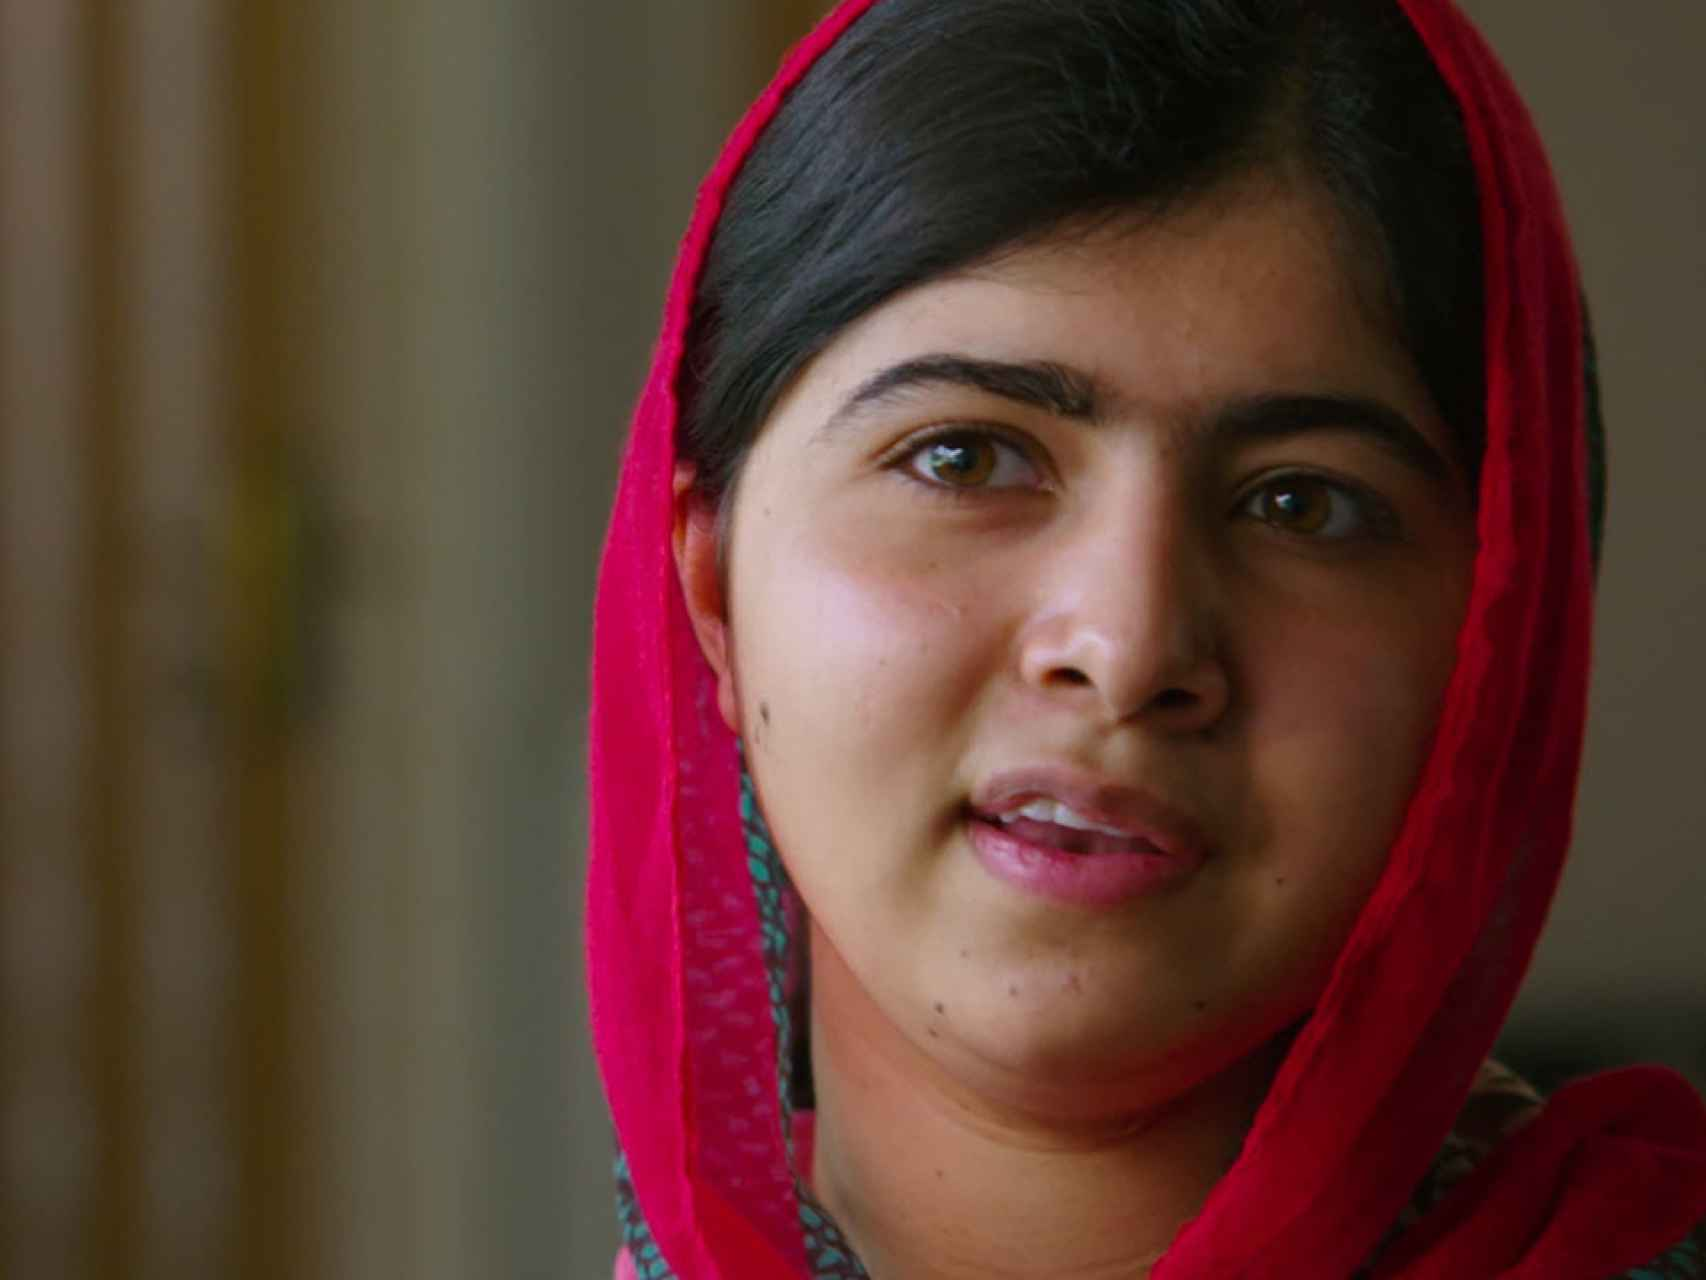 Malala, en un momento del documental.